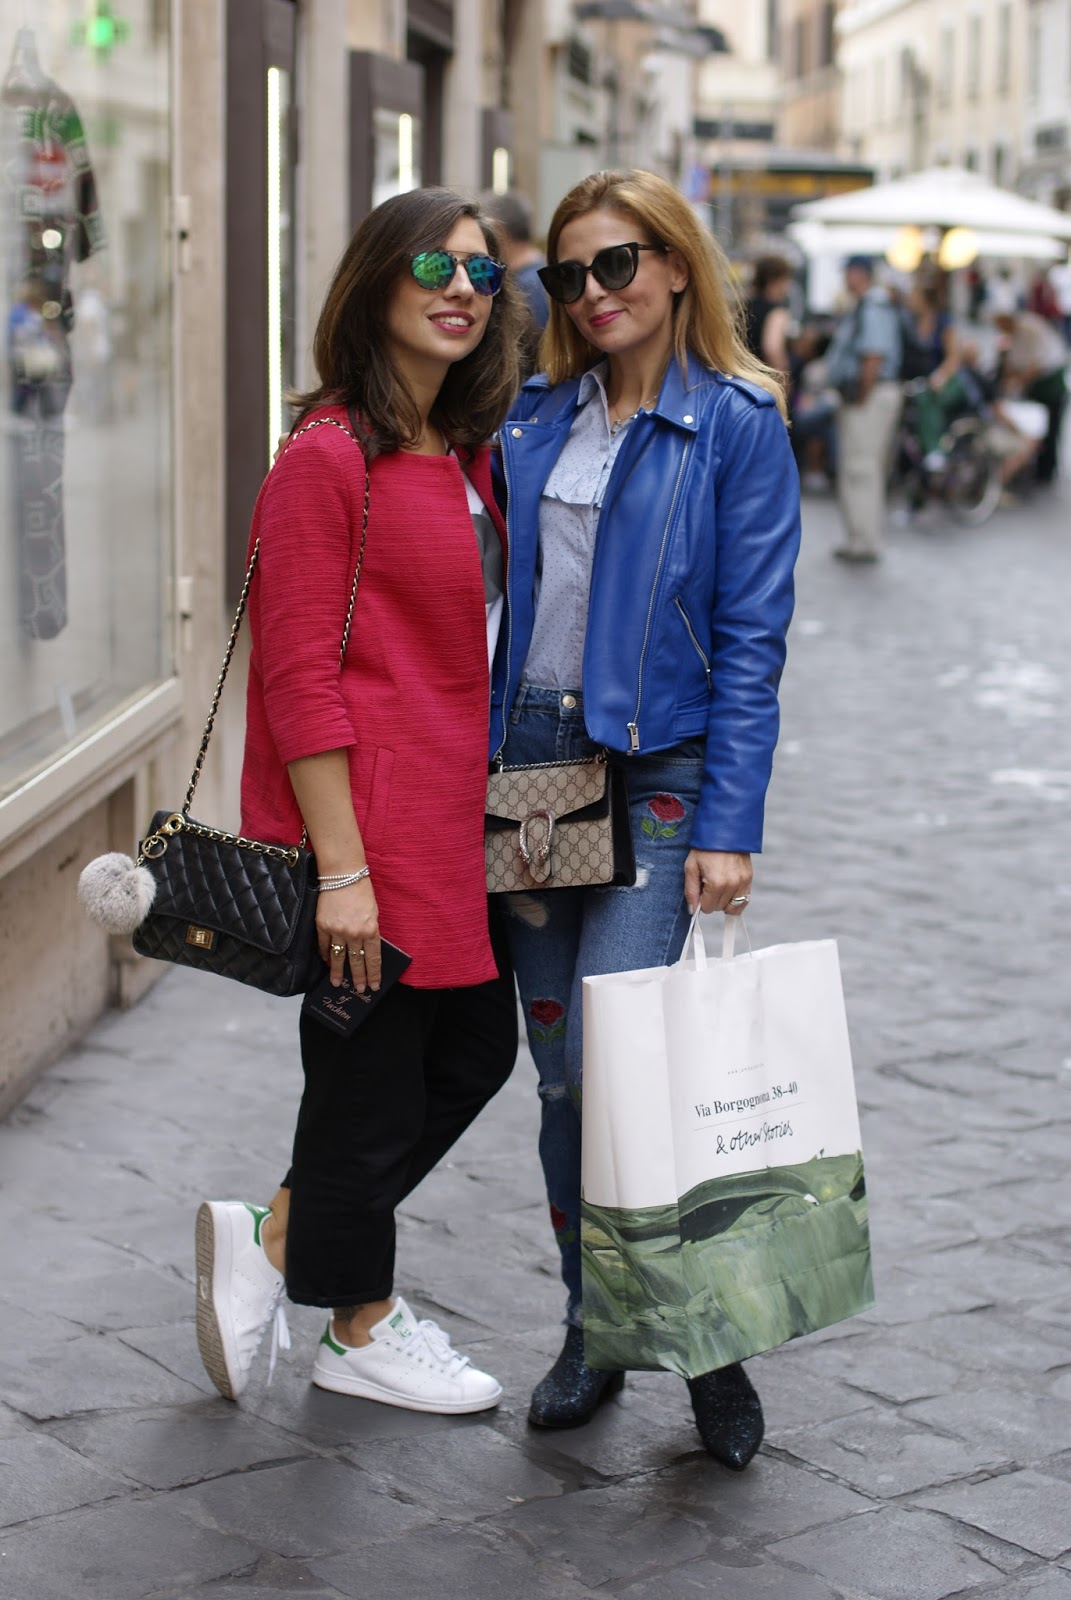 Fashion Bloggers meetup in Rome: Iolanda e Valentina on Fashion and Cookies fashion blog, fashion blogger style